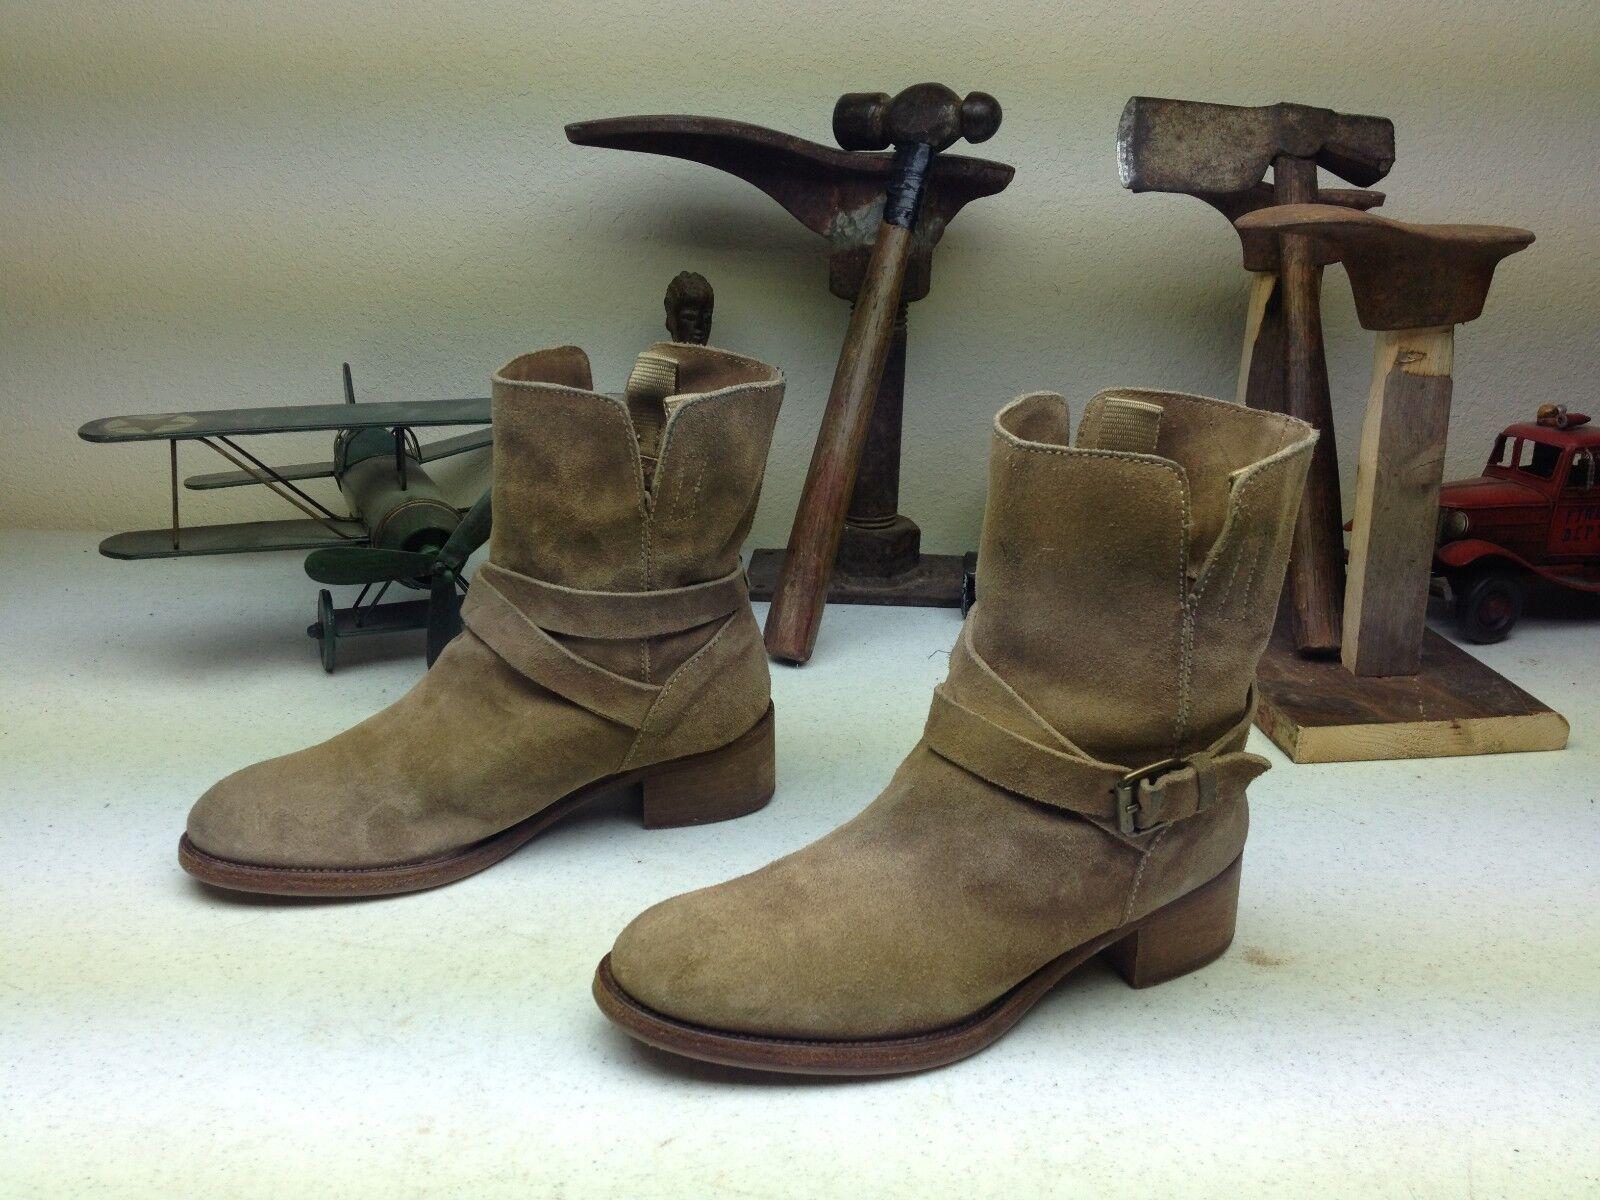 Django sadore  Juliette sadore Django cuero botas de tobillo - humo 5386f6